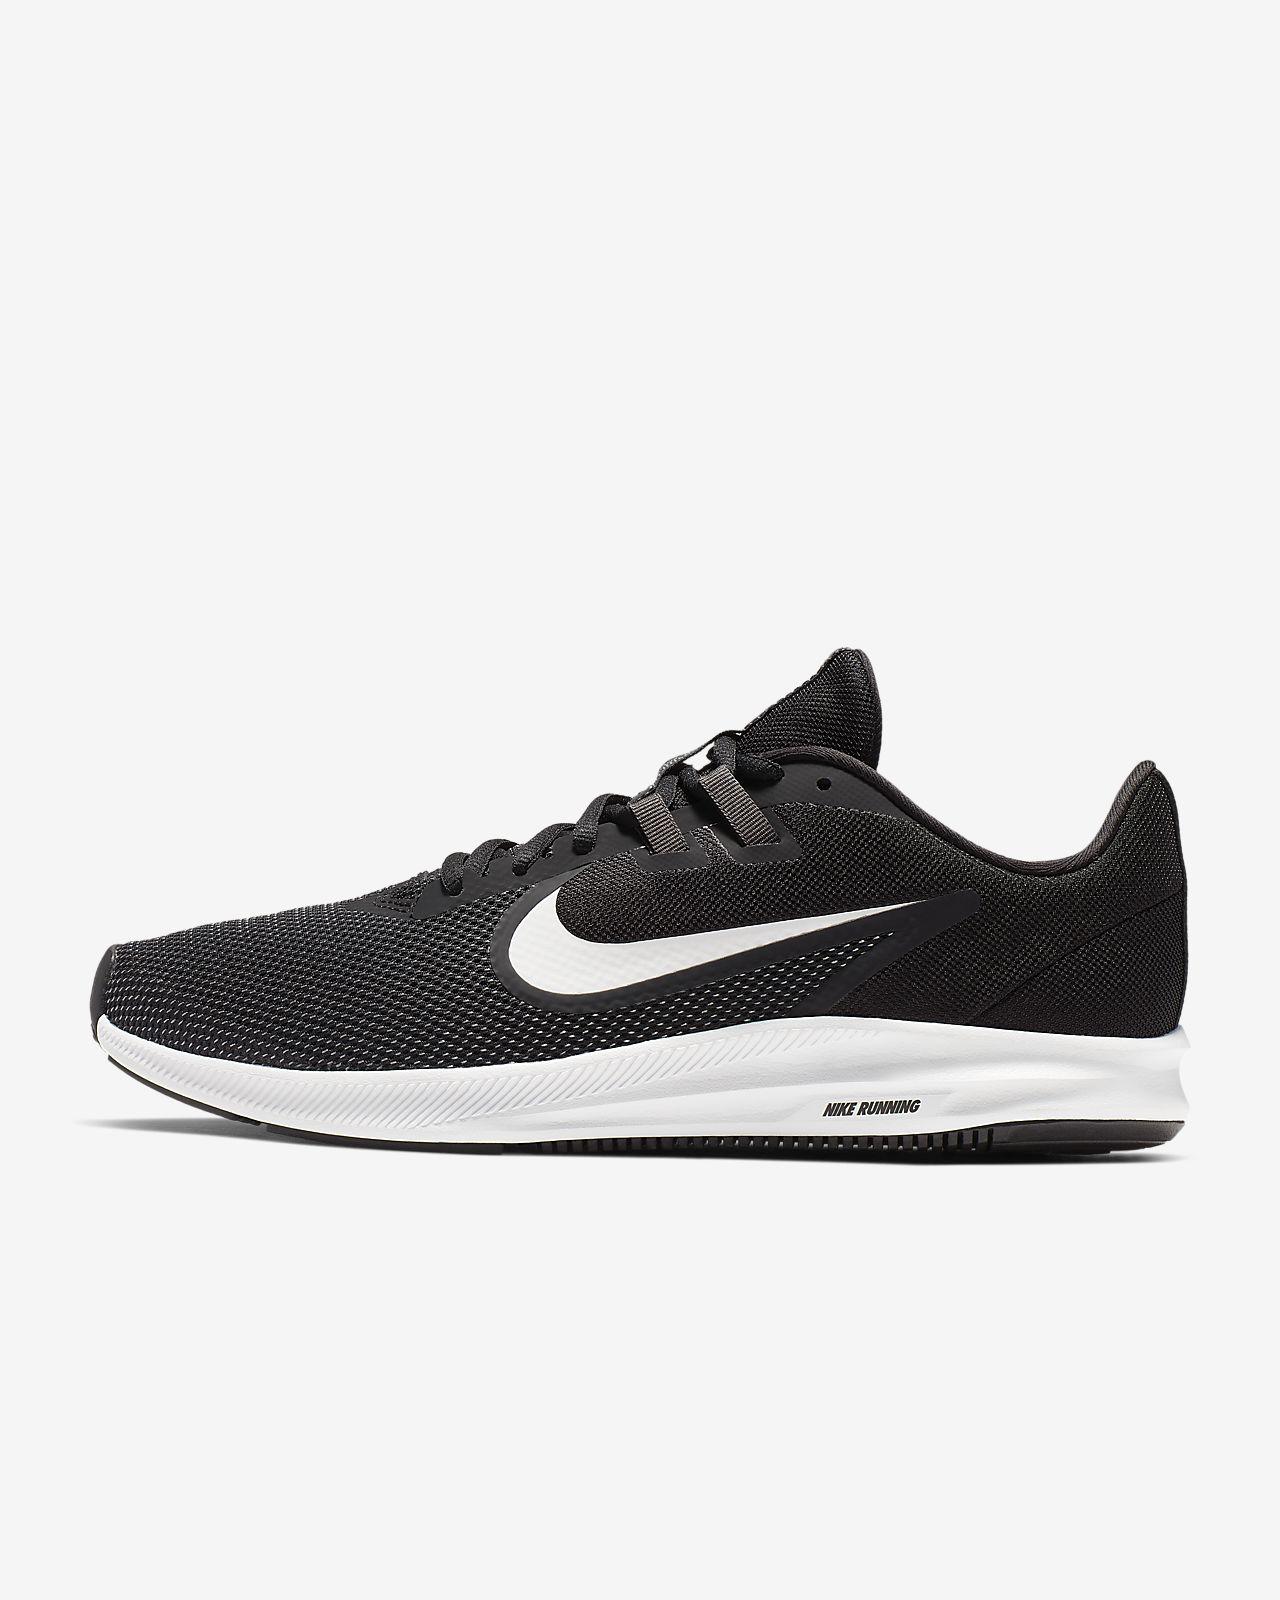 Sapatilhas de running Nike Downshifter 9 para homem